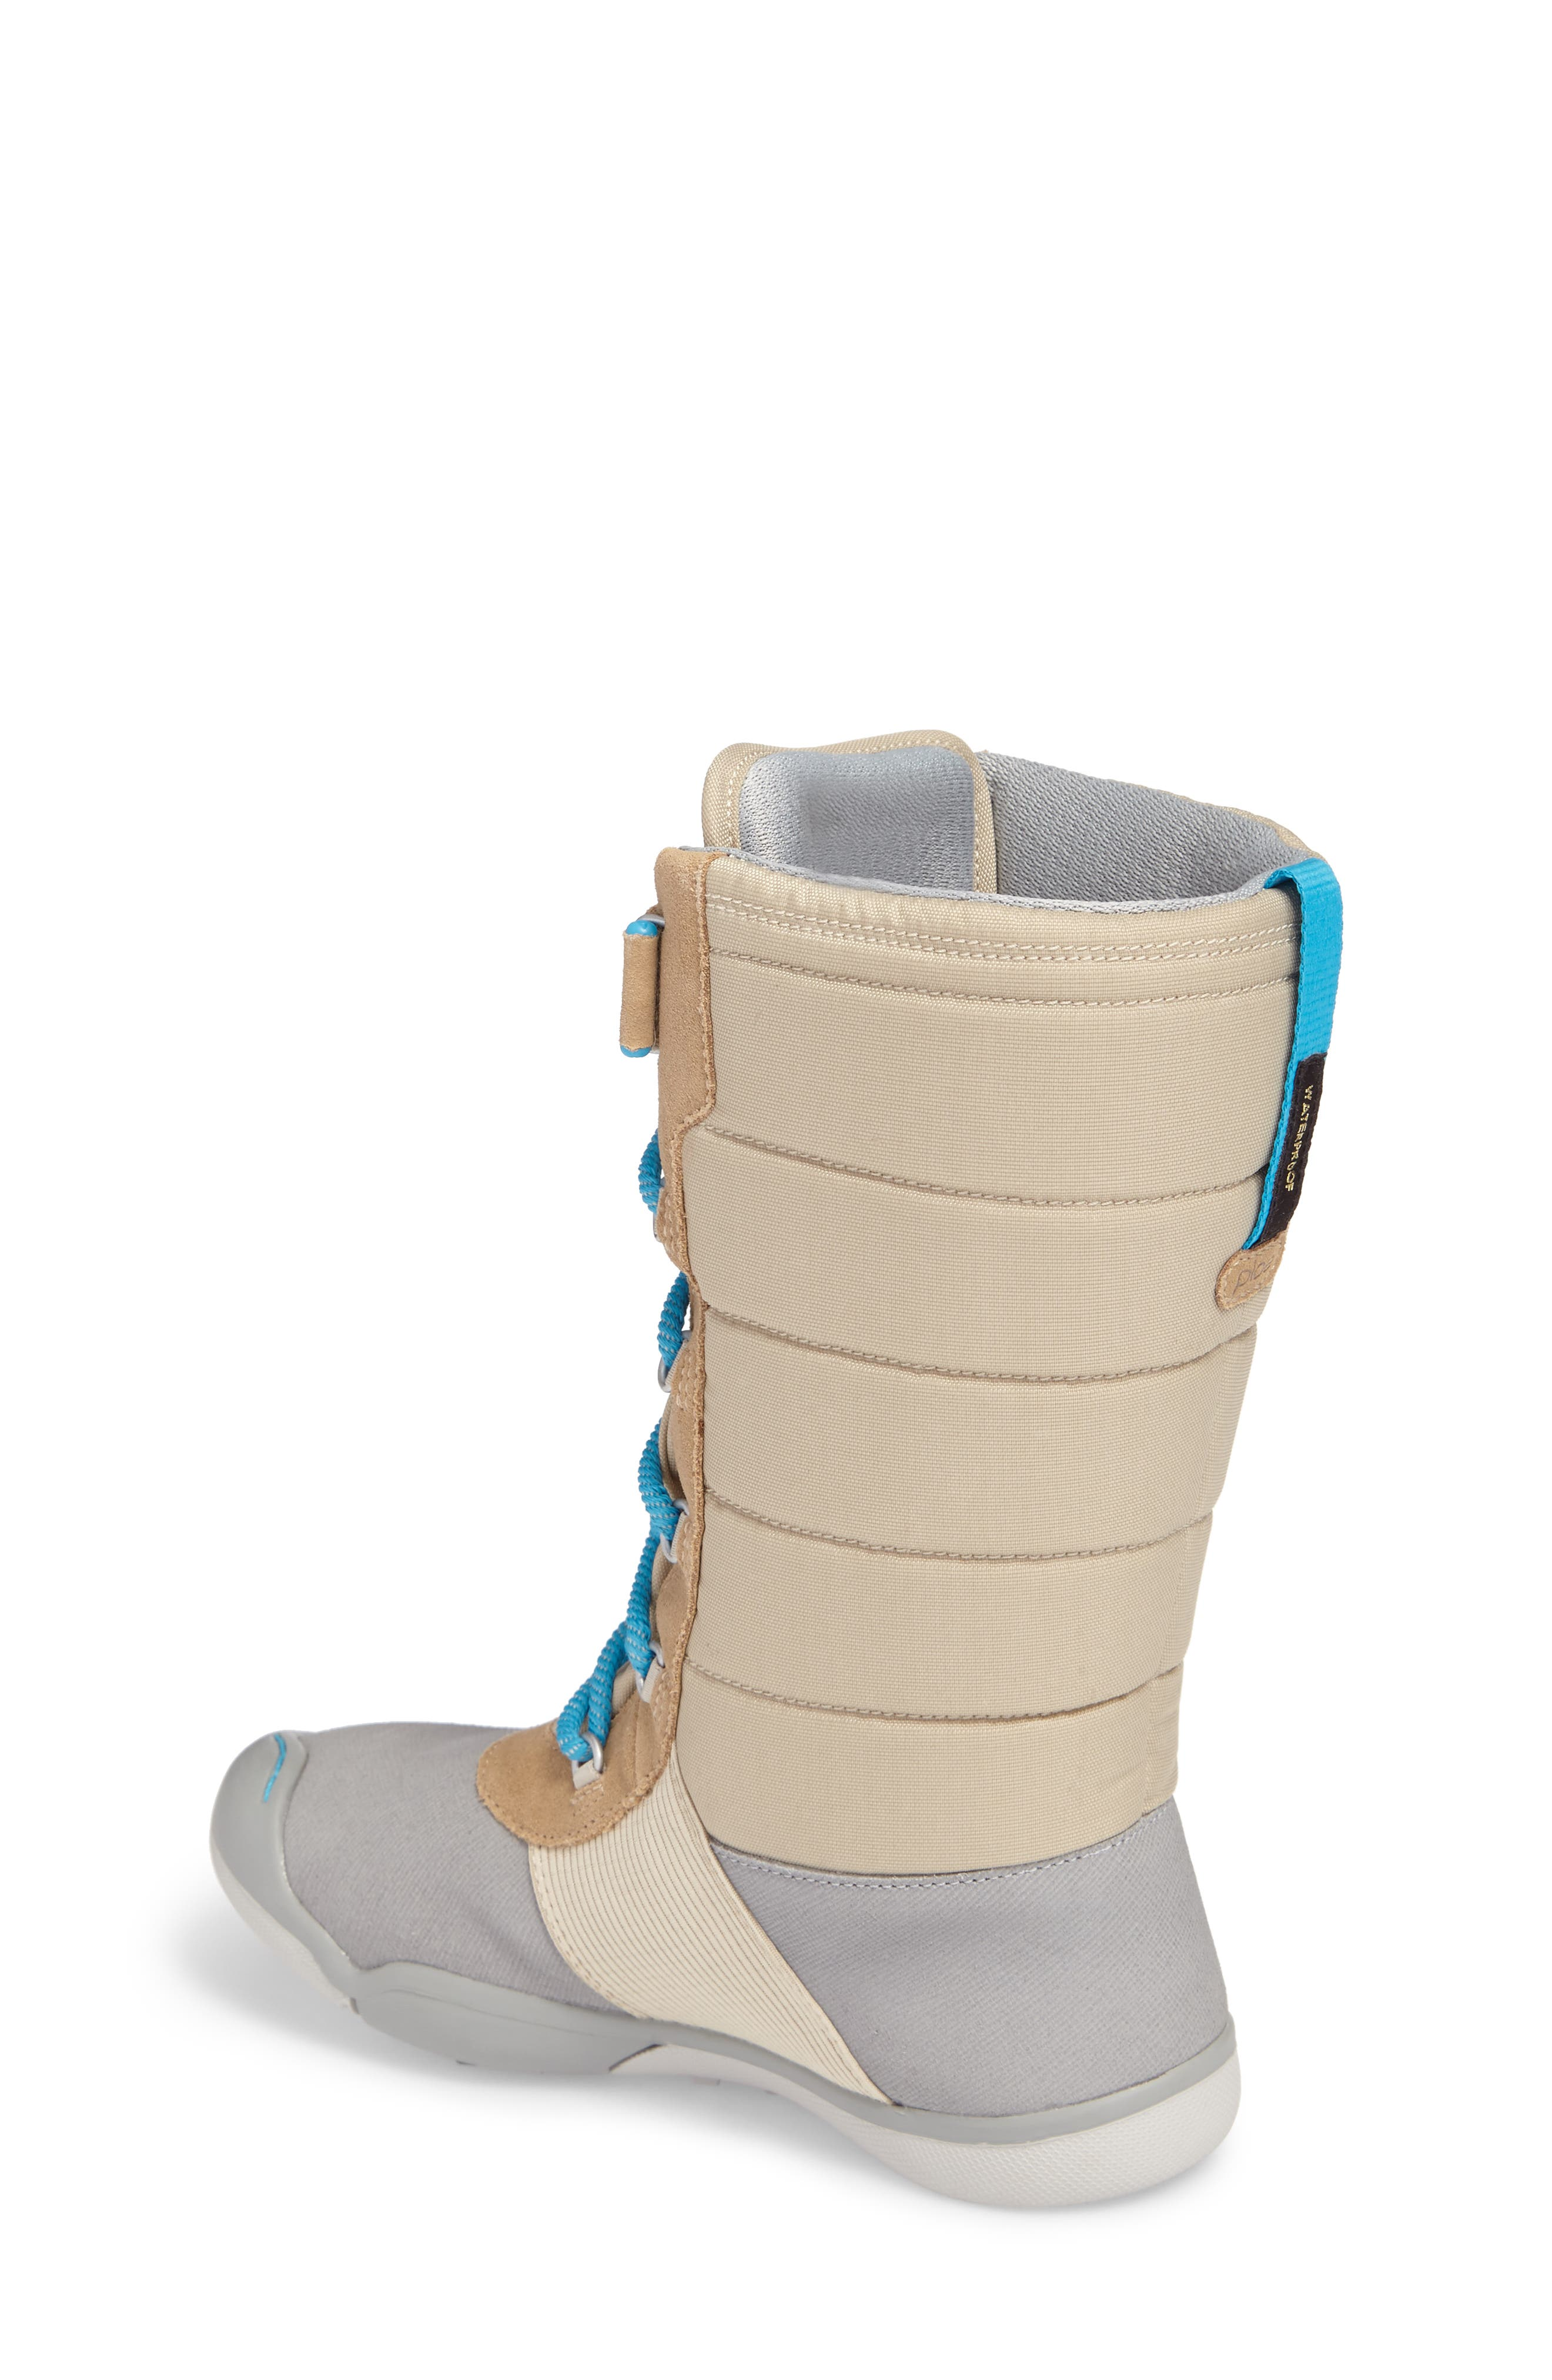 Alternate Image 2  - PLAE Jack Customizable Waterproof Boot (Toddler & Little Kid)